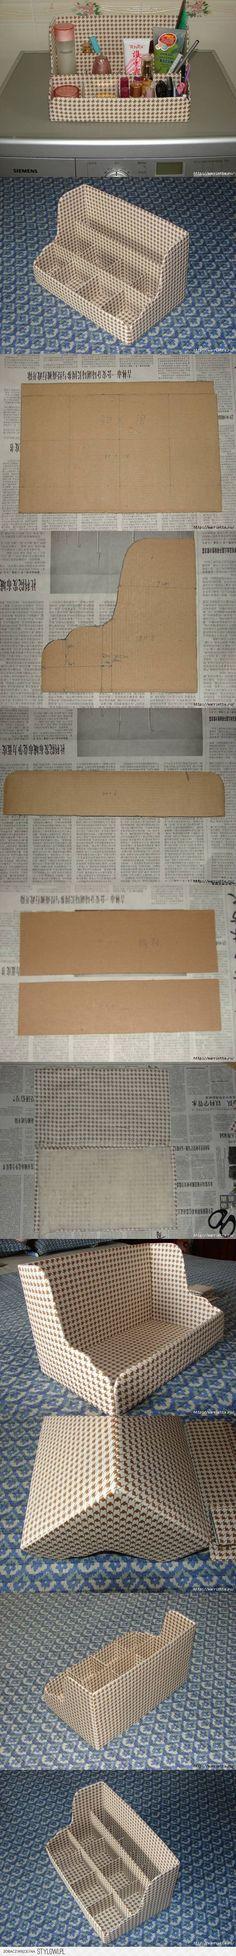 DIY Cardboard Shelves Organizer DIY Projects | UsefulDI… na Stylowi.pl